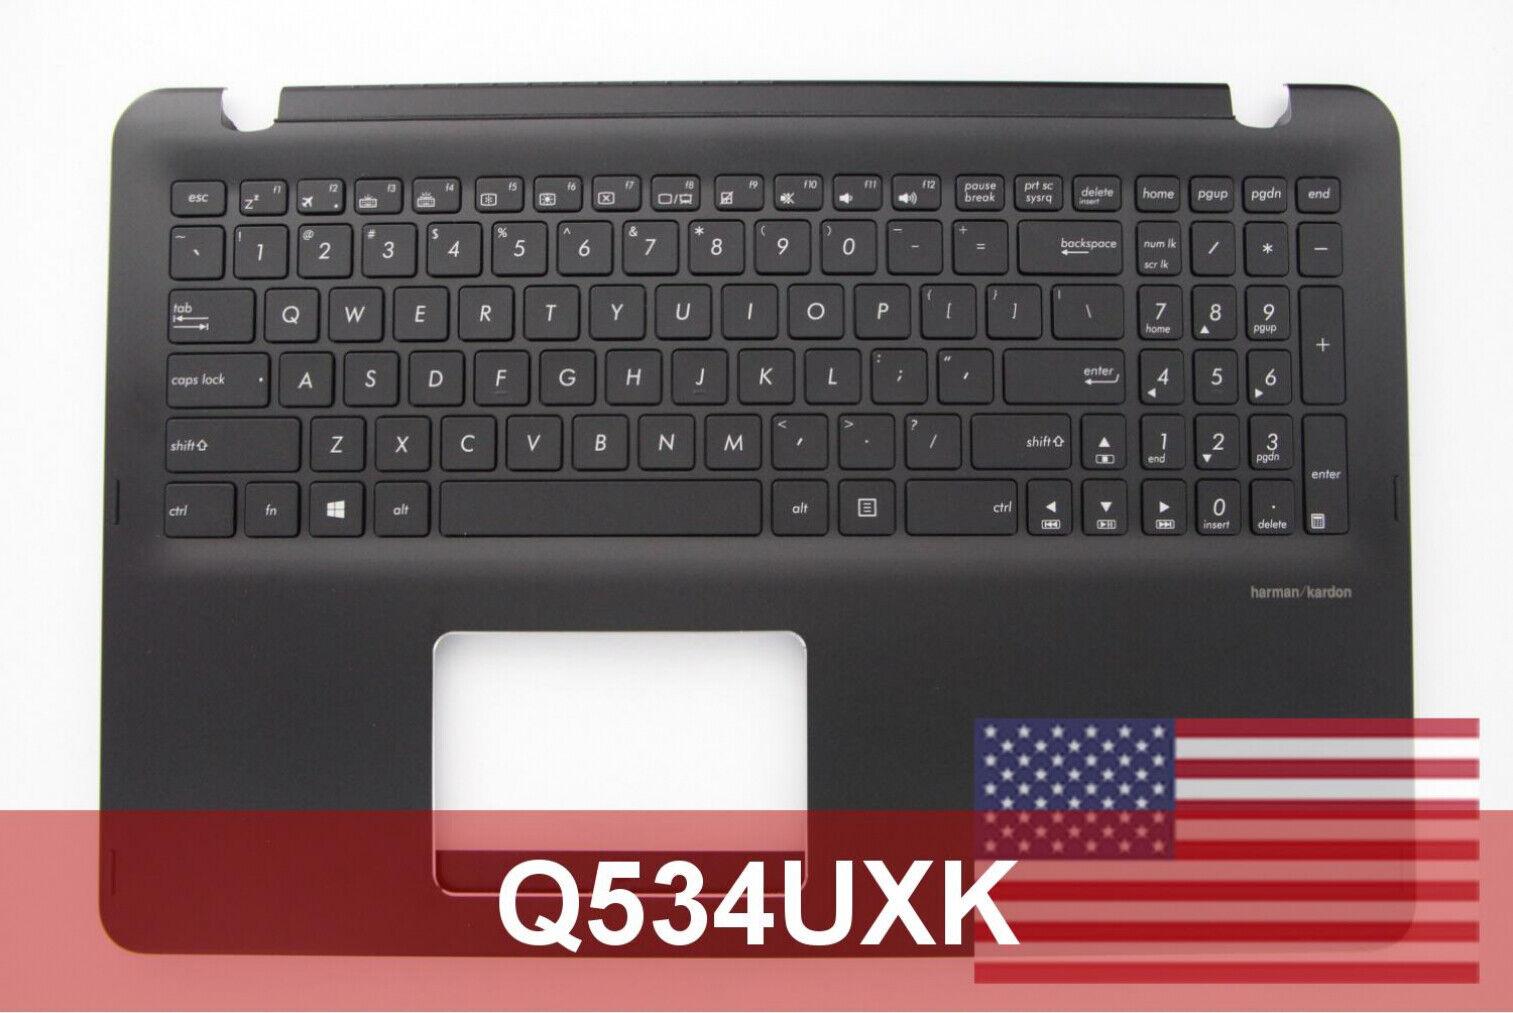 NEW US English Keybord for Asus Q524UQK Q534UXK keyboard backlit